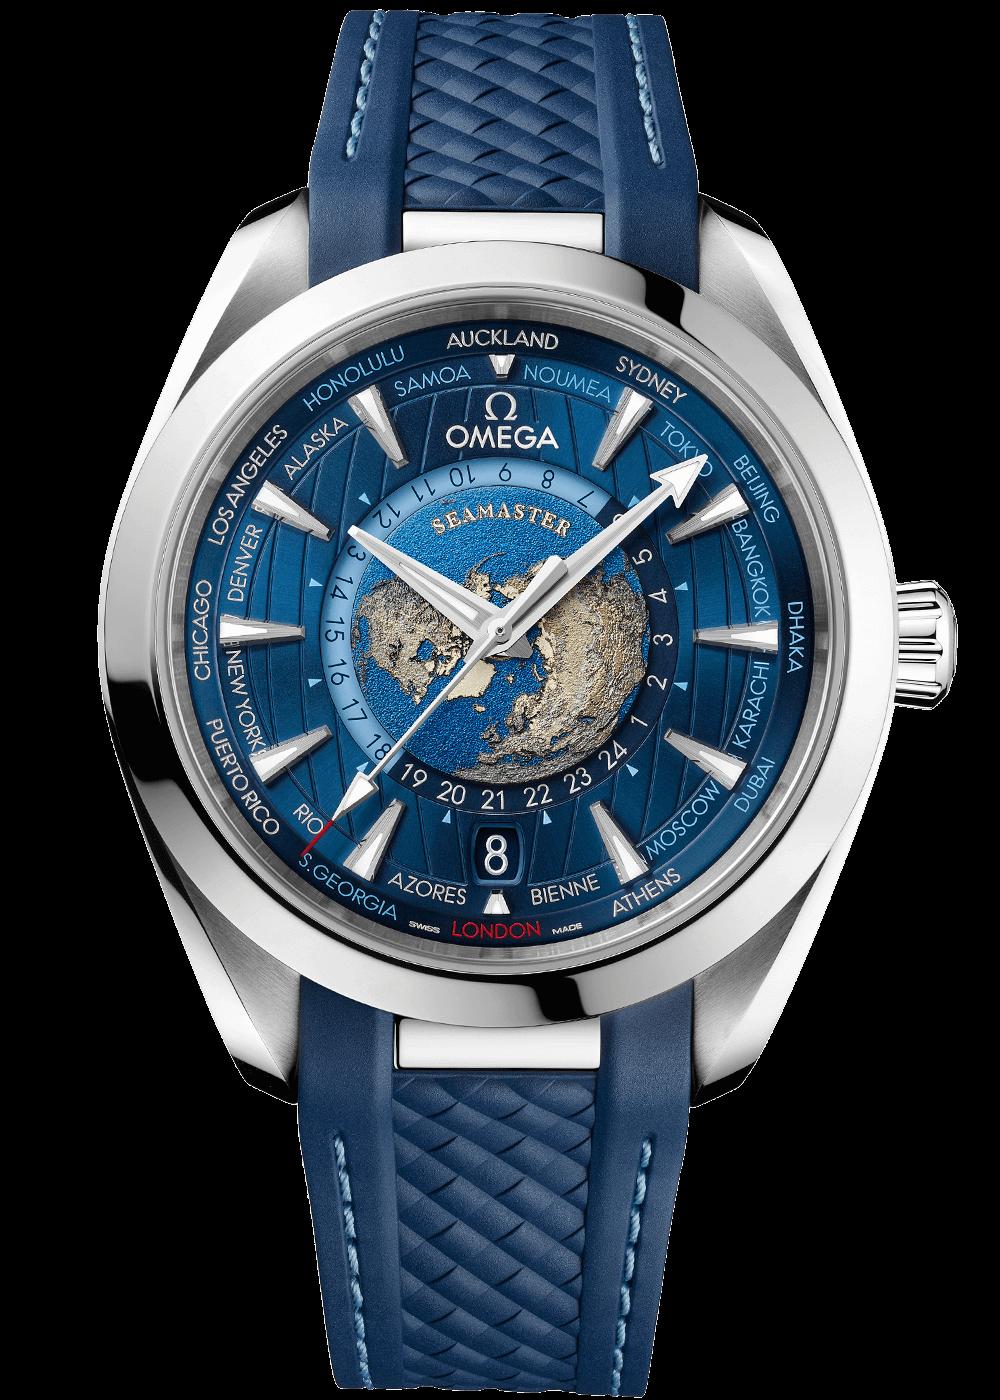 Omega Aqua Terra Master Chronometer Worldtimer